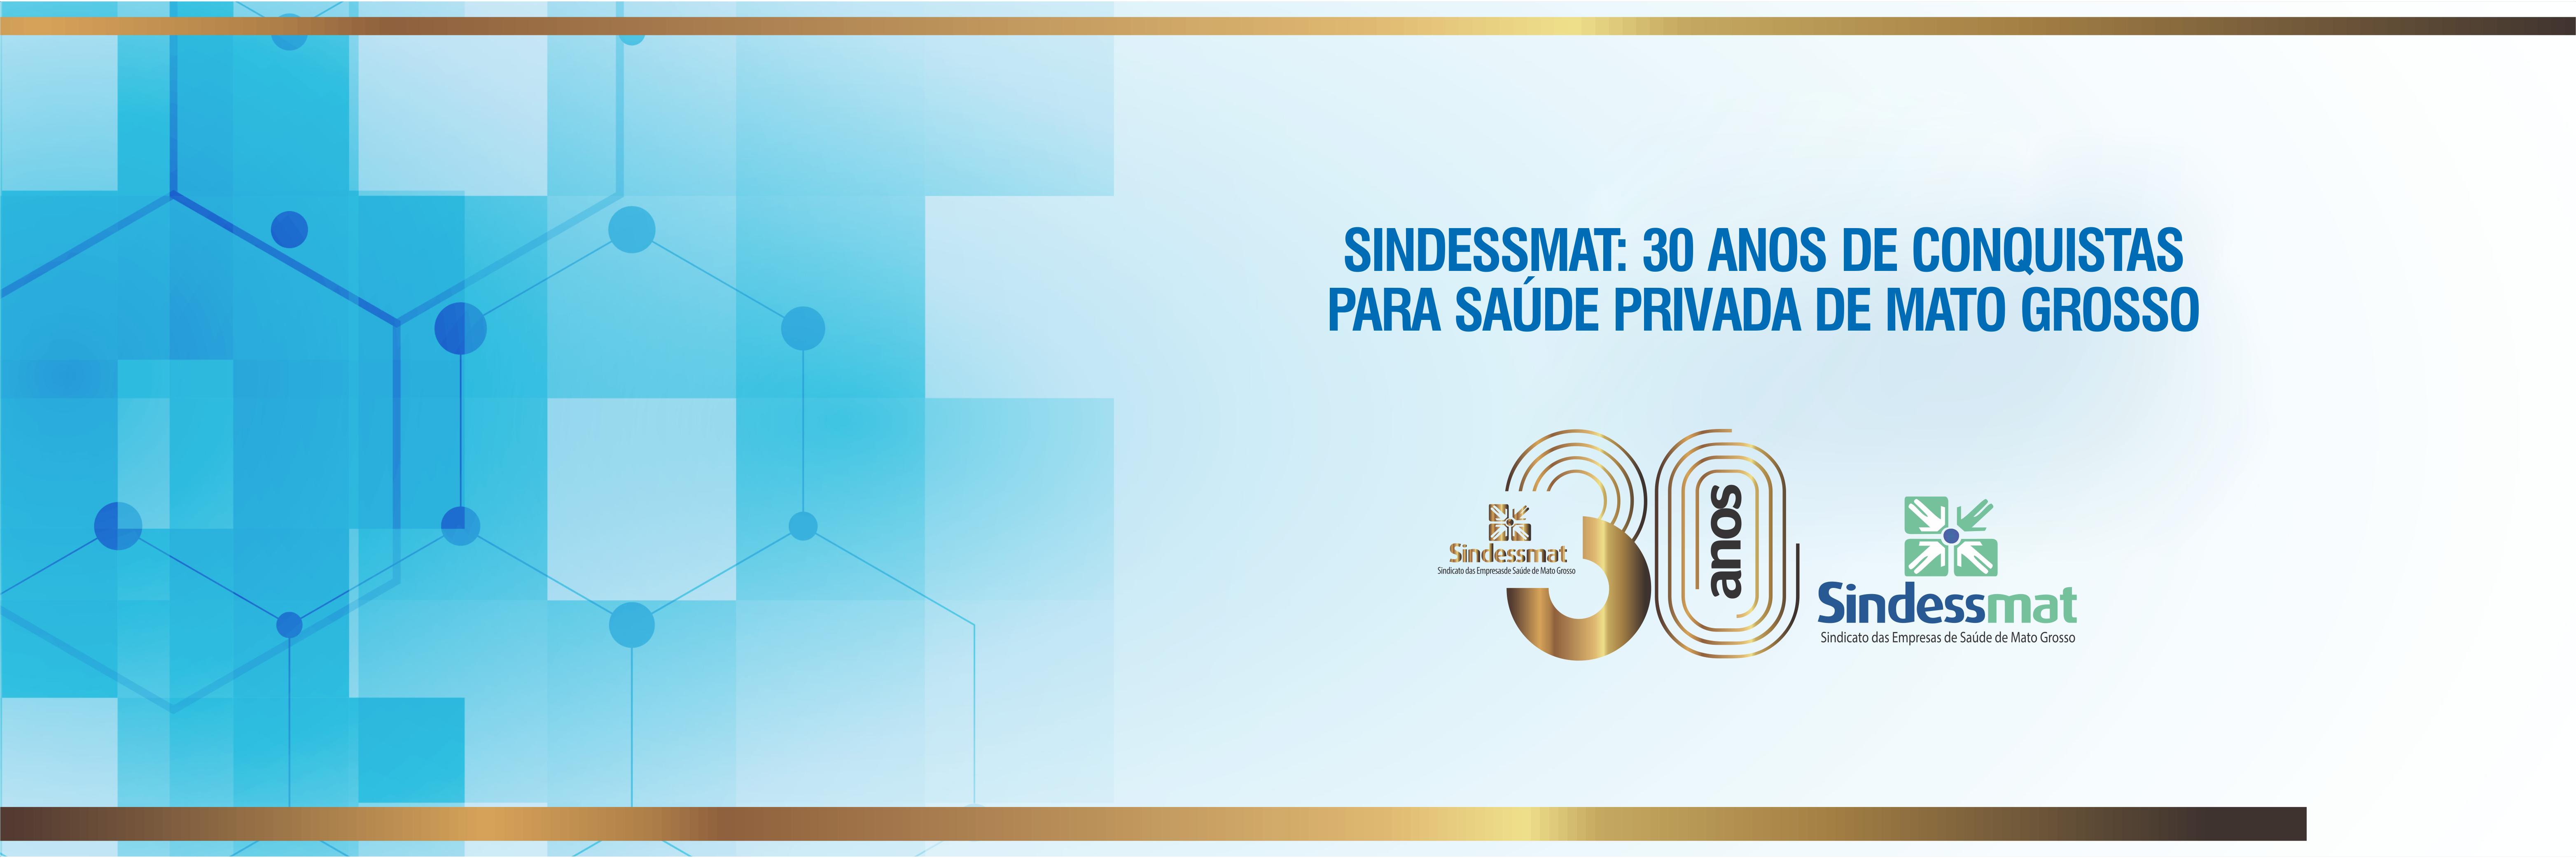 CAPA-SIOTE-SINDESSMAT-30-ANOS